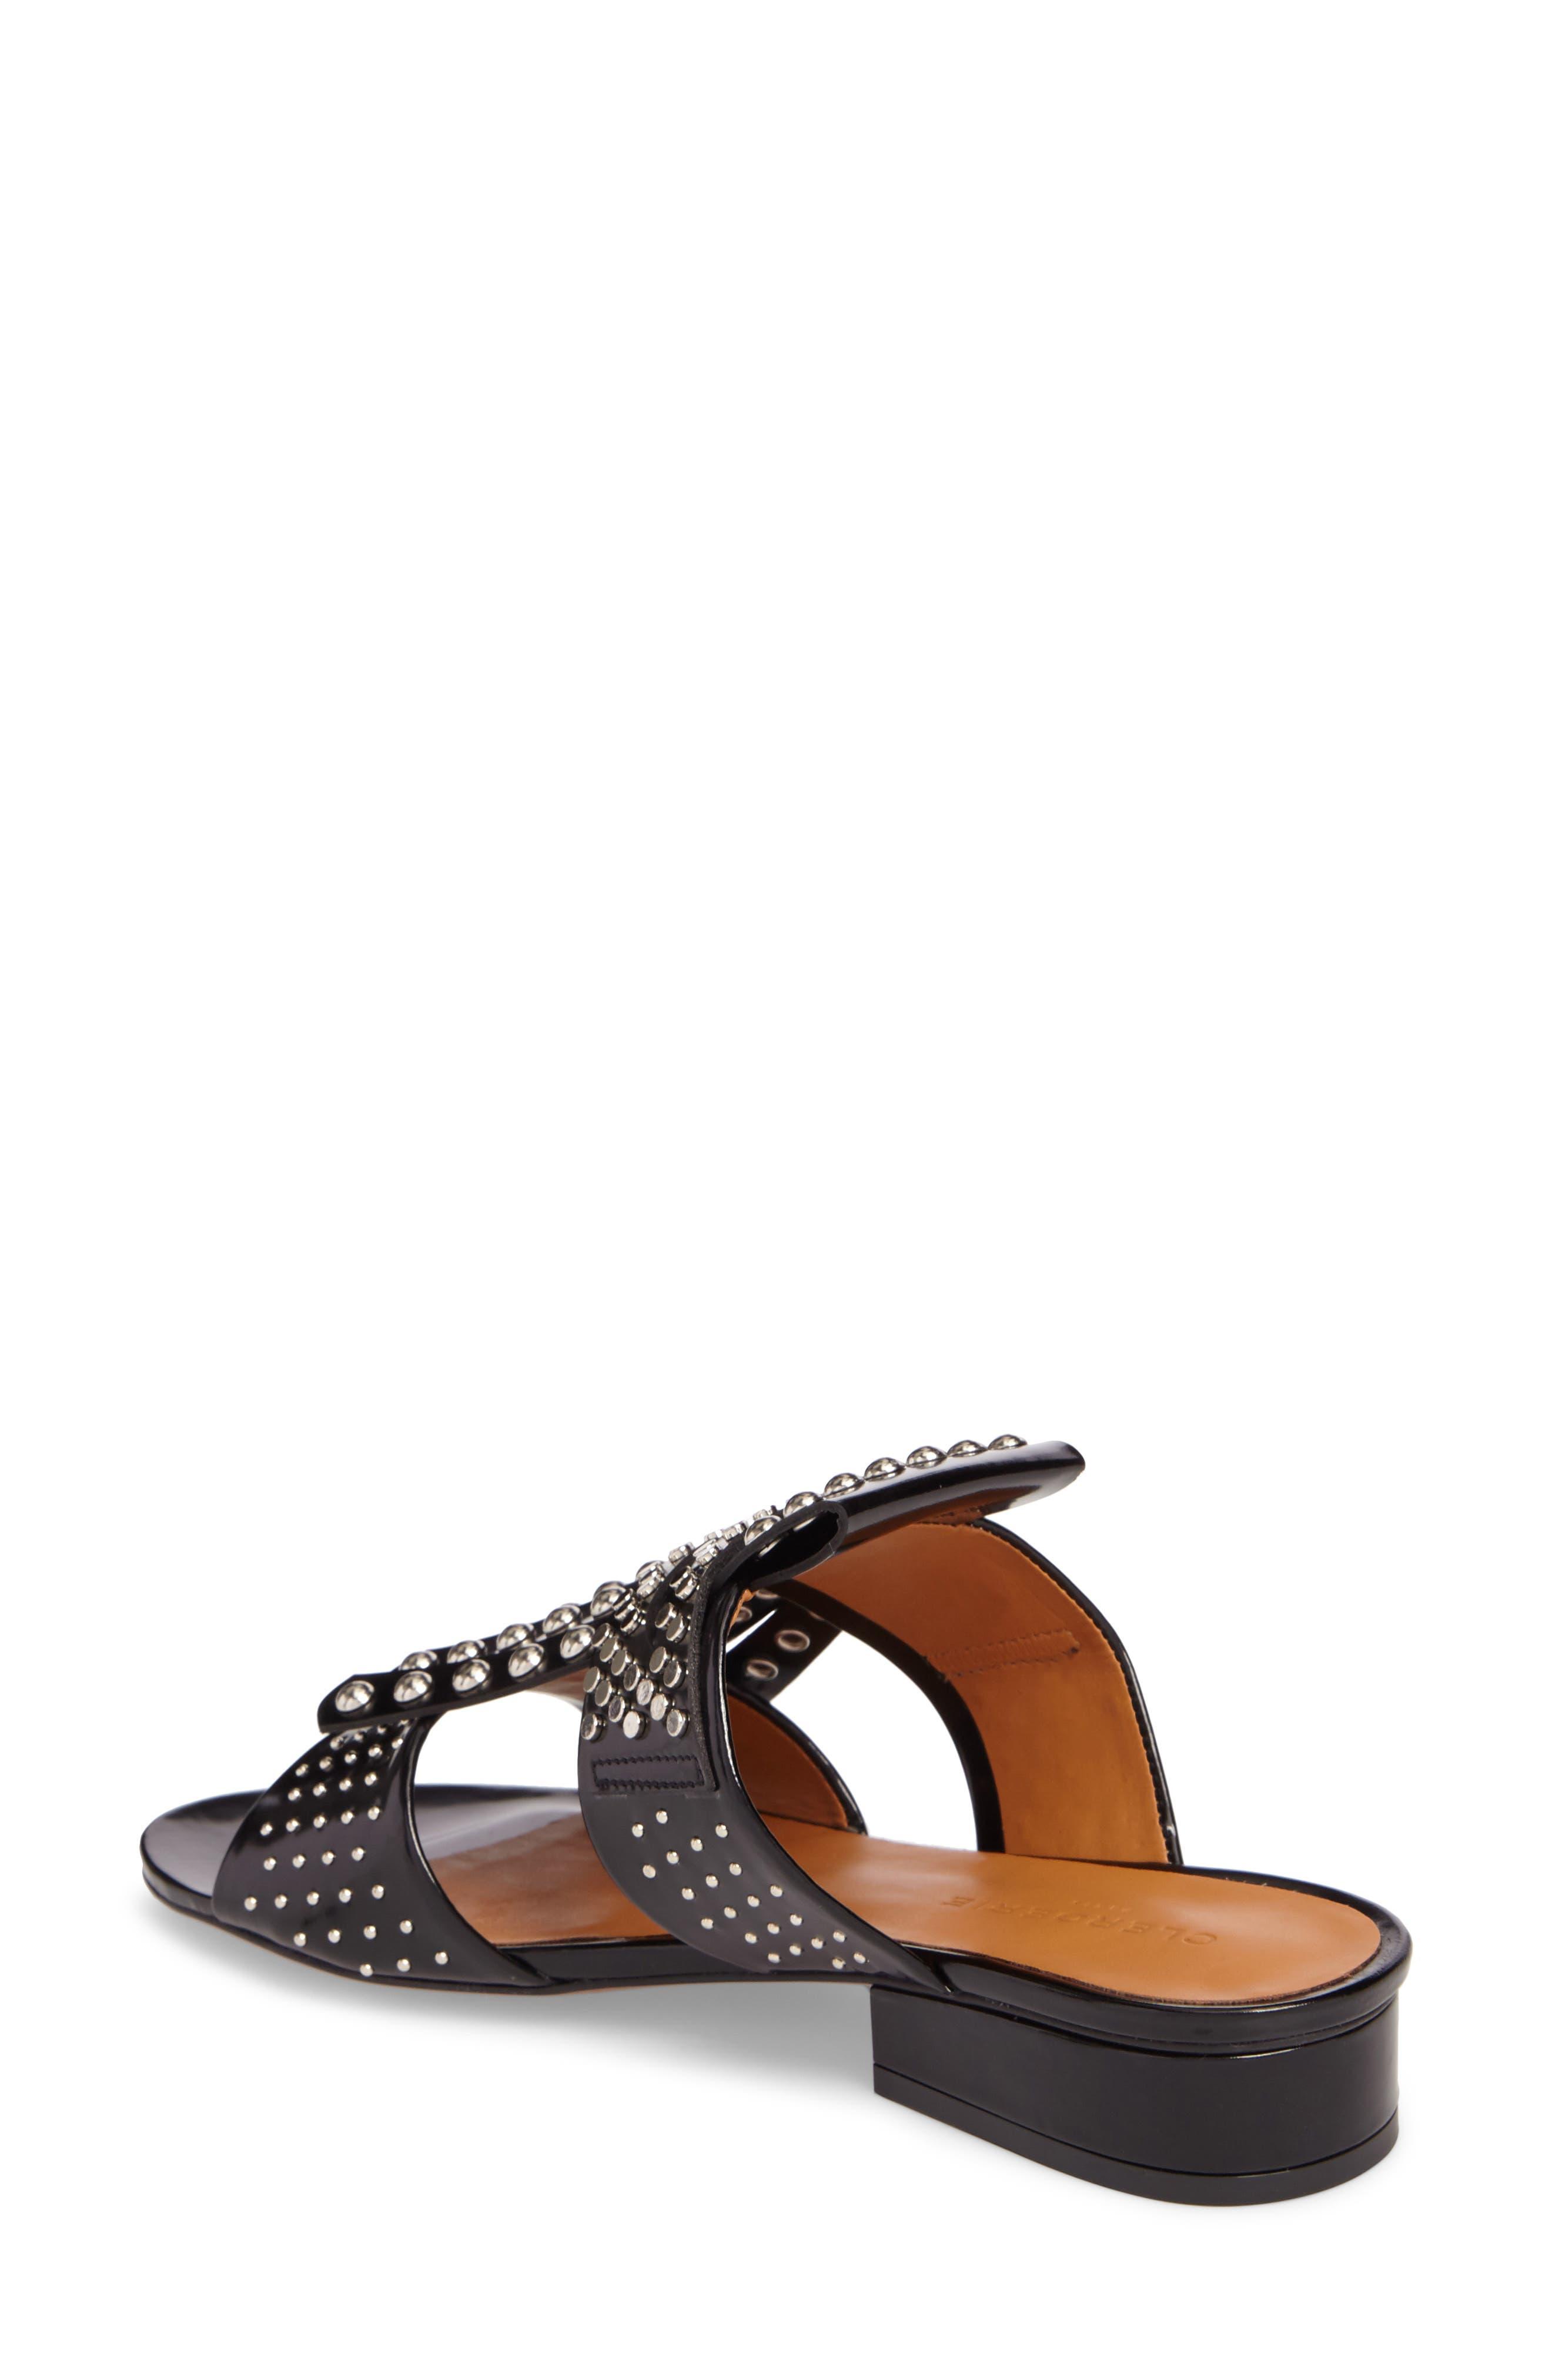 Figlouc Studded Sandal,                             Alternate thumbnail 2, color,                             001